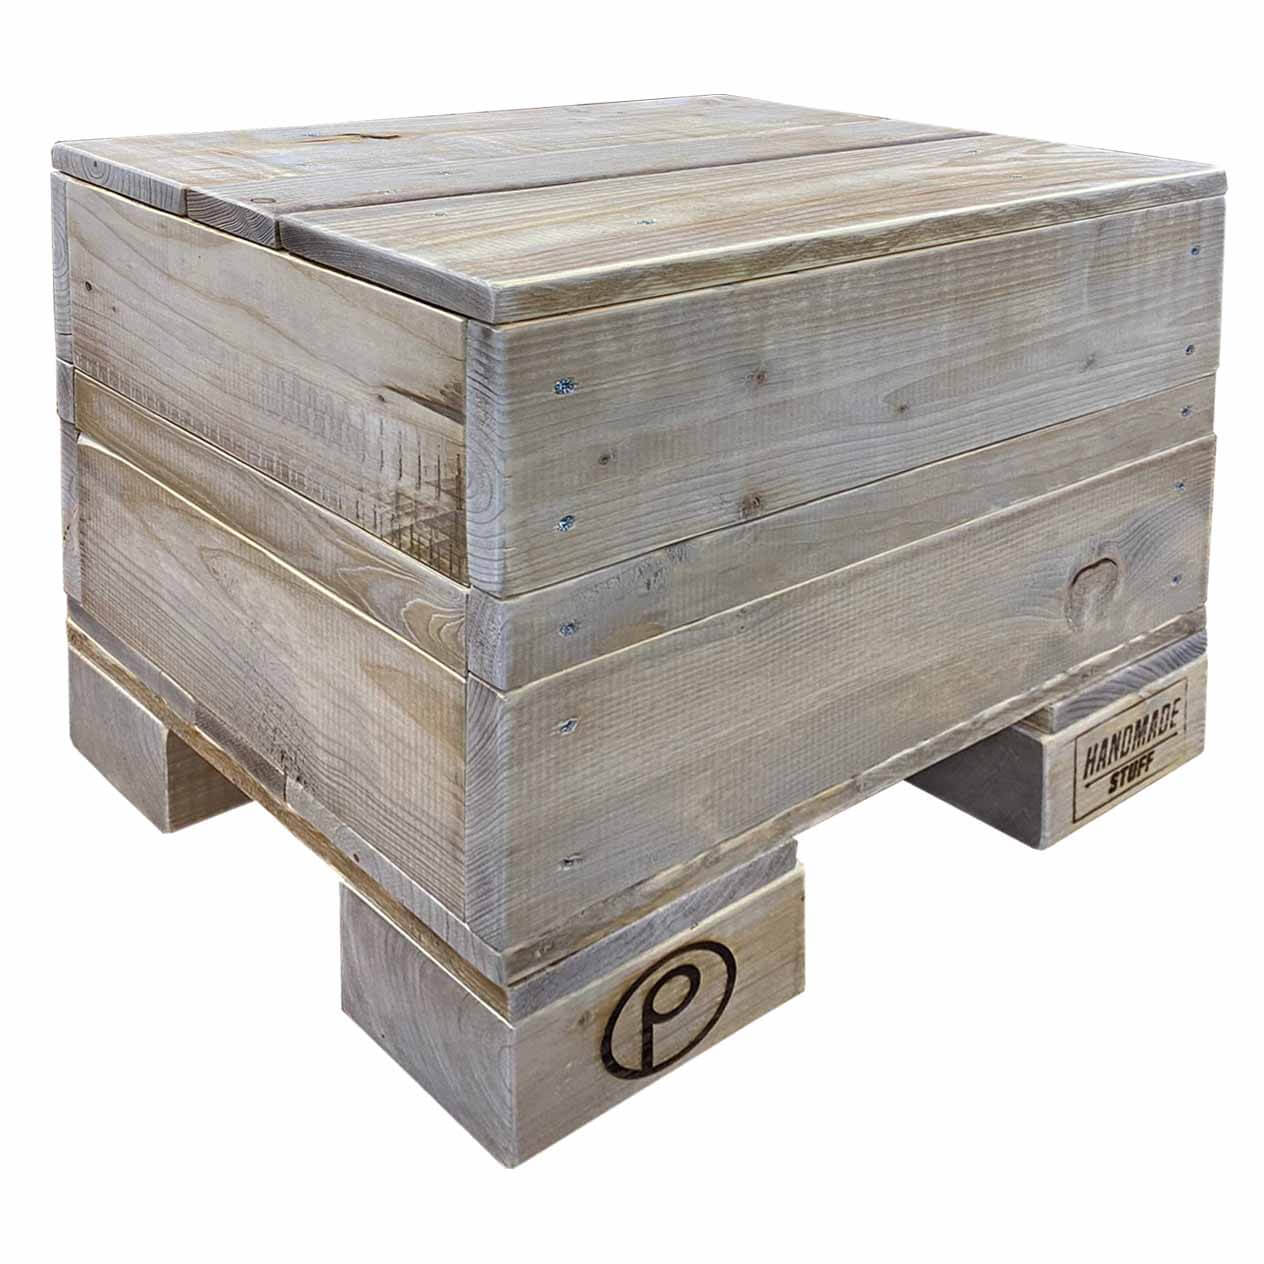 Hocker-Cube aus Paletten-Palettenmöbel